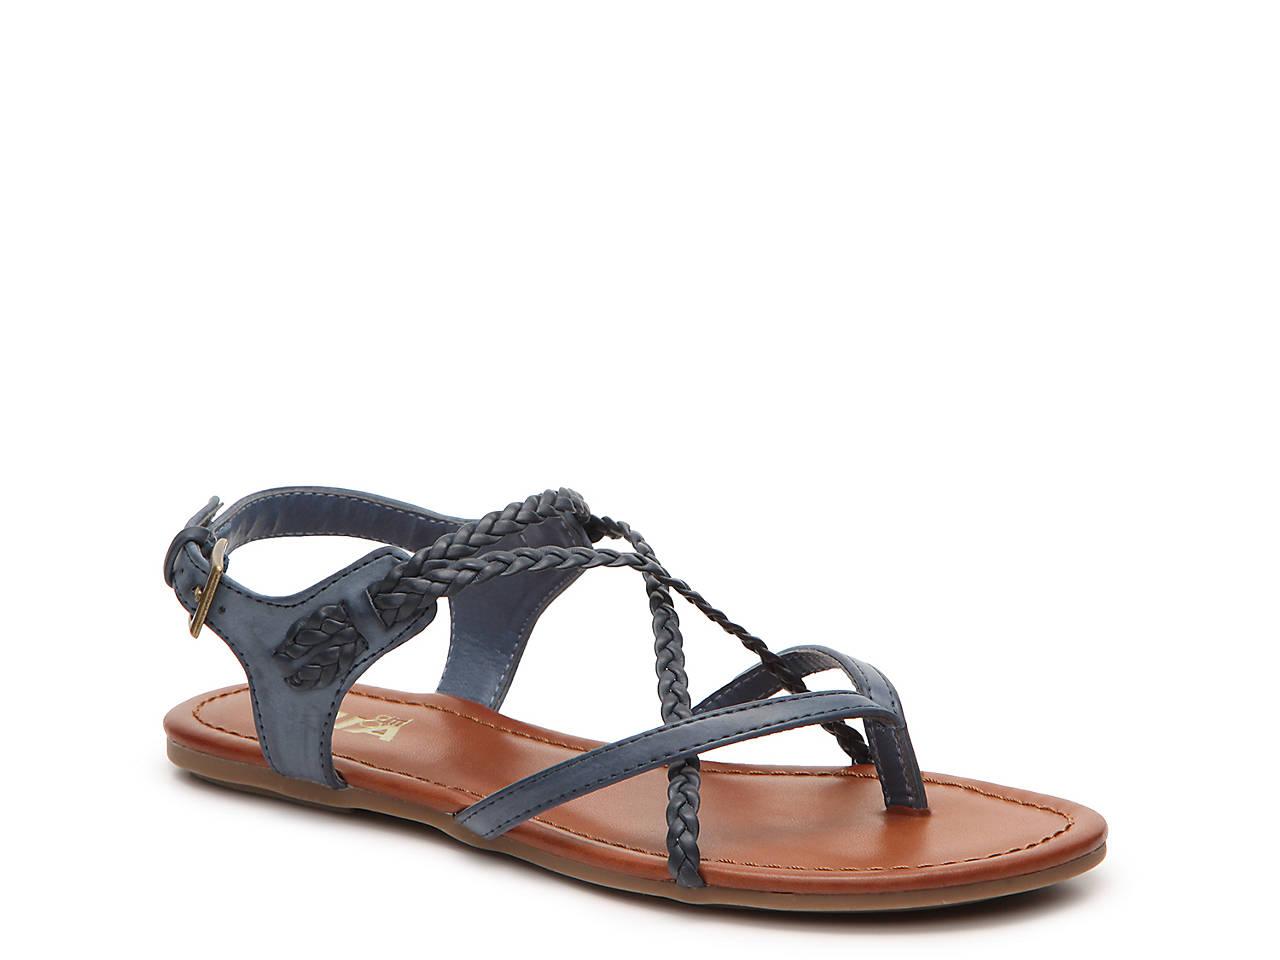 54e84554412 Mia Adrianna Gladiator Sandal Women s Shoes